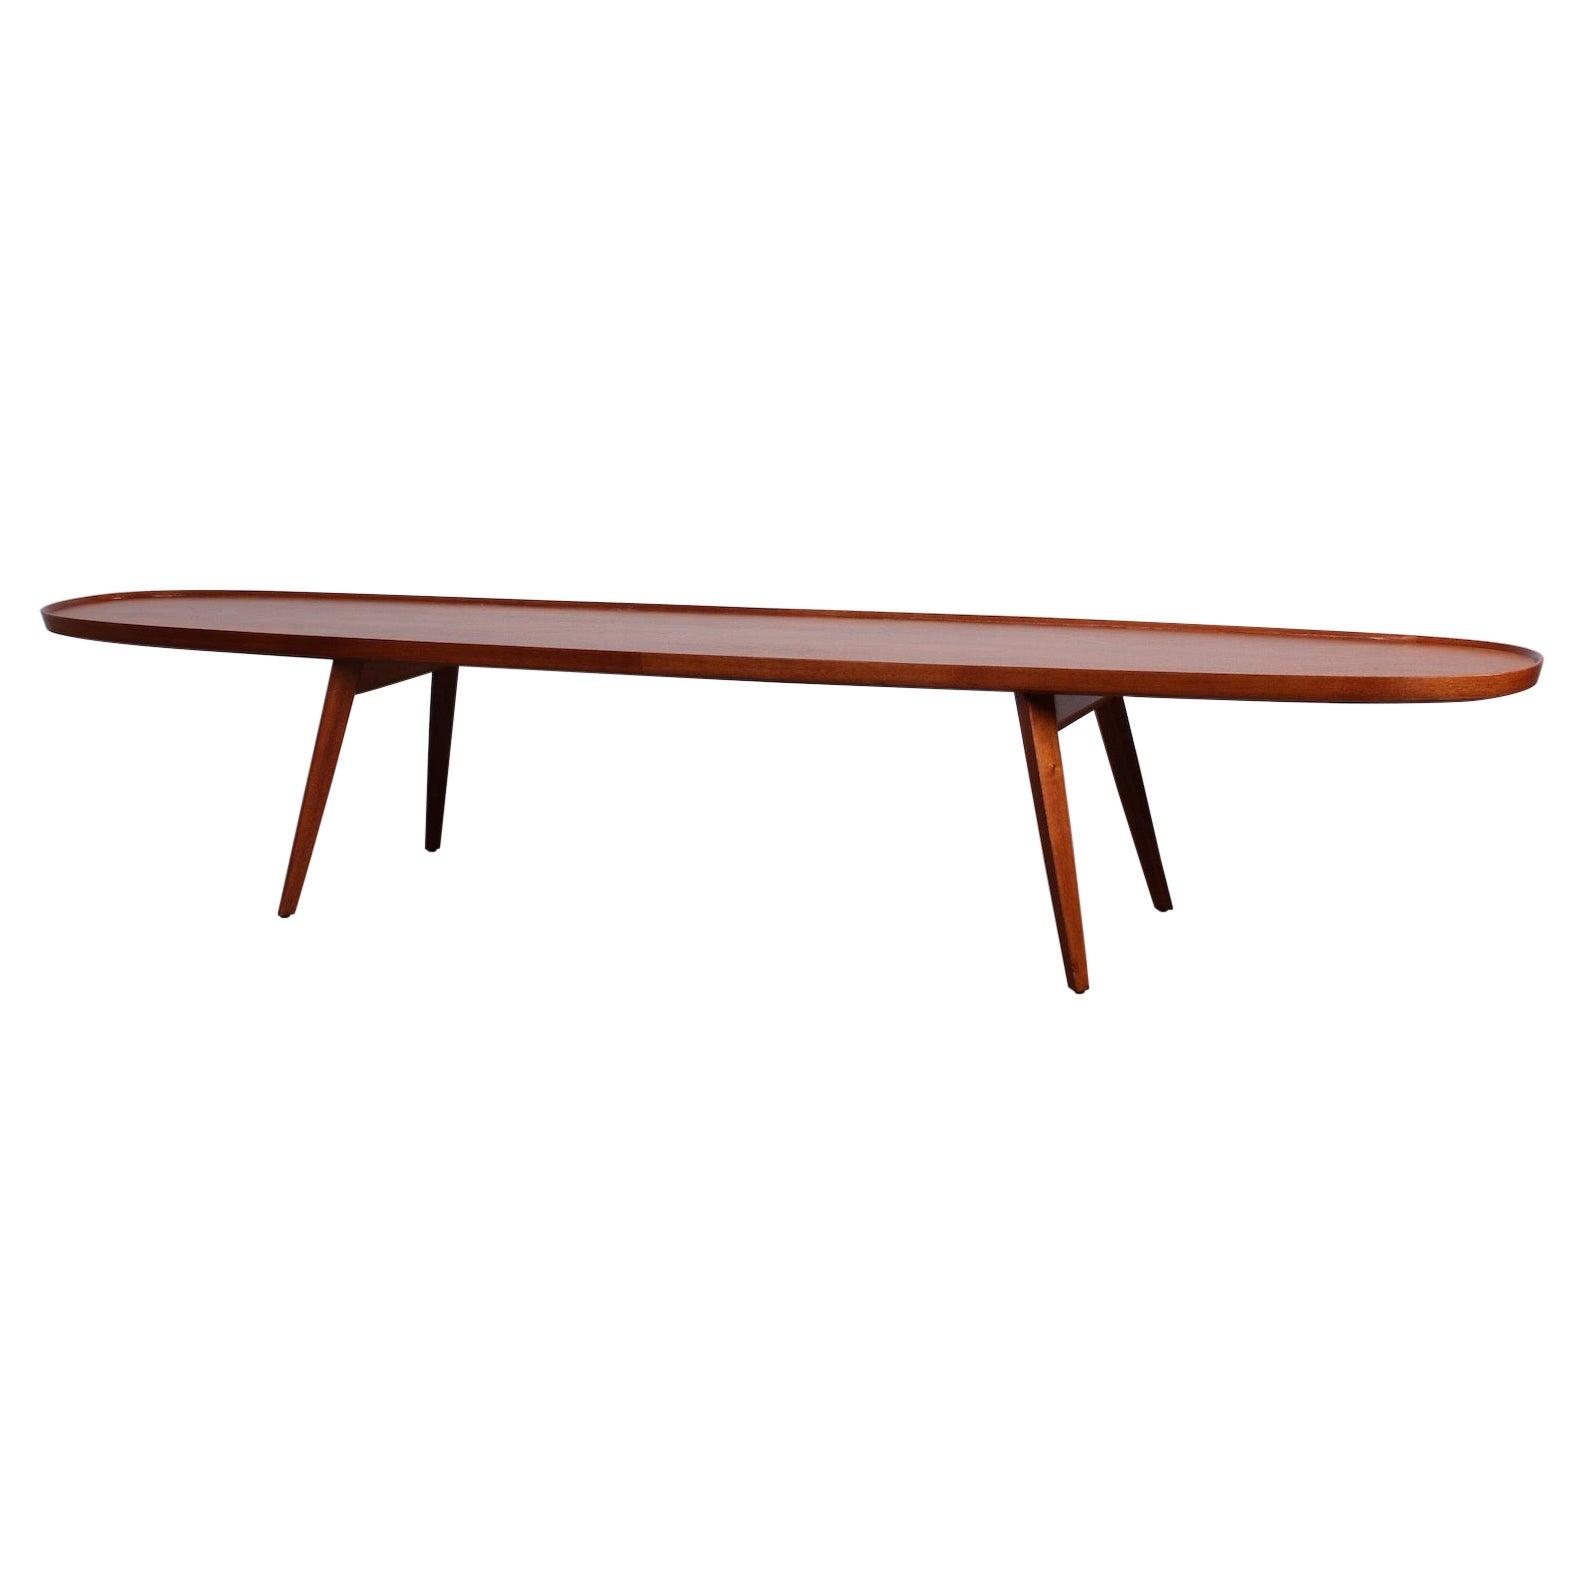 Dunbar Surfboard Coffee Table by Edward Wormley